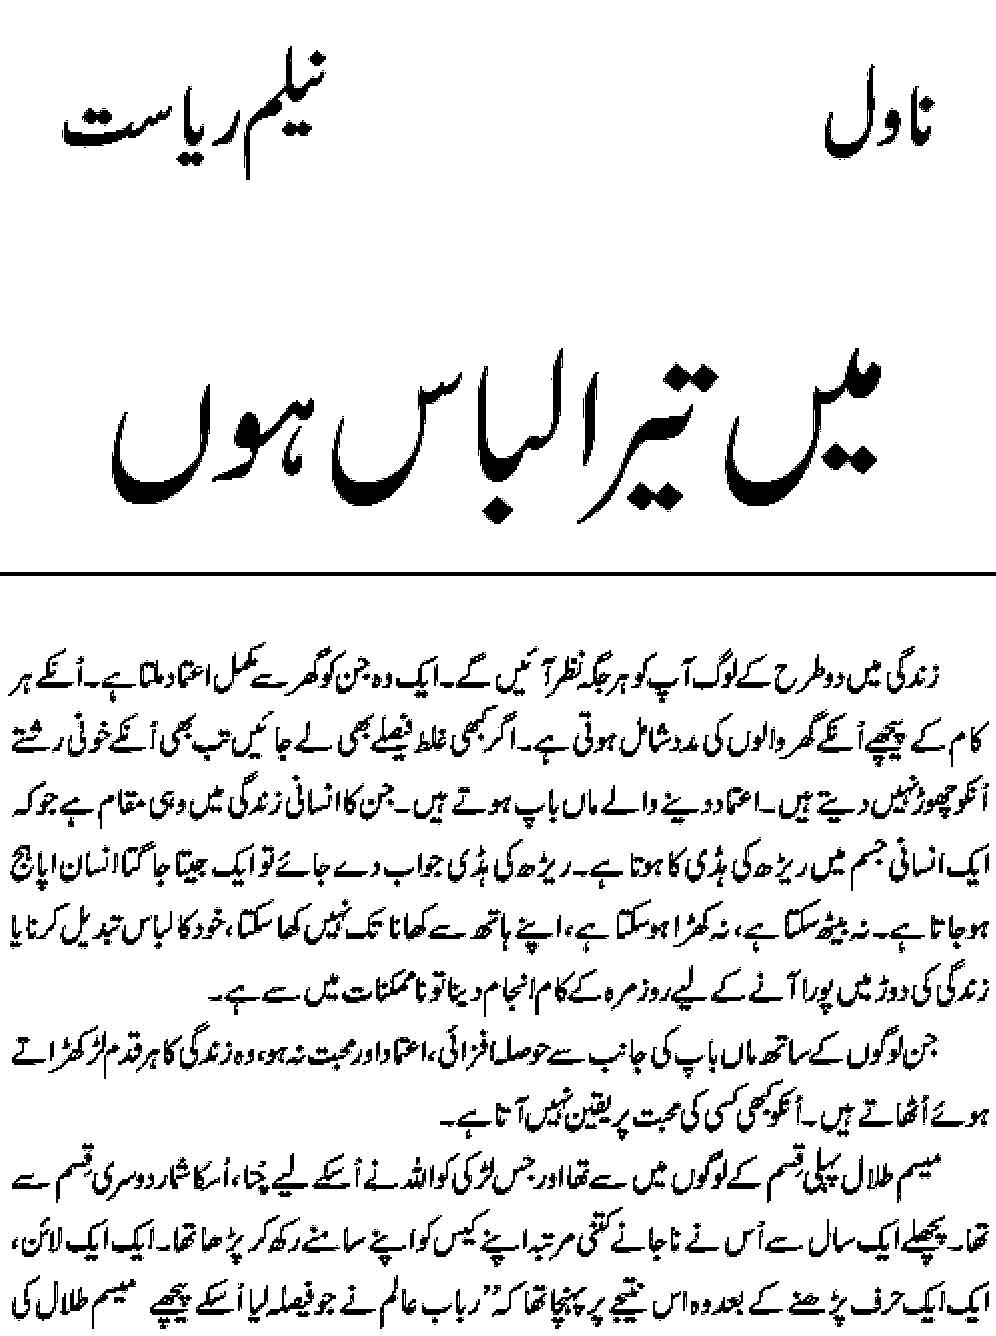 Love stories read online in urdu